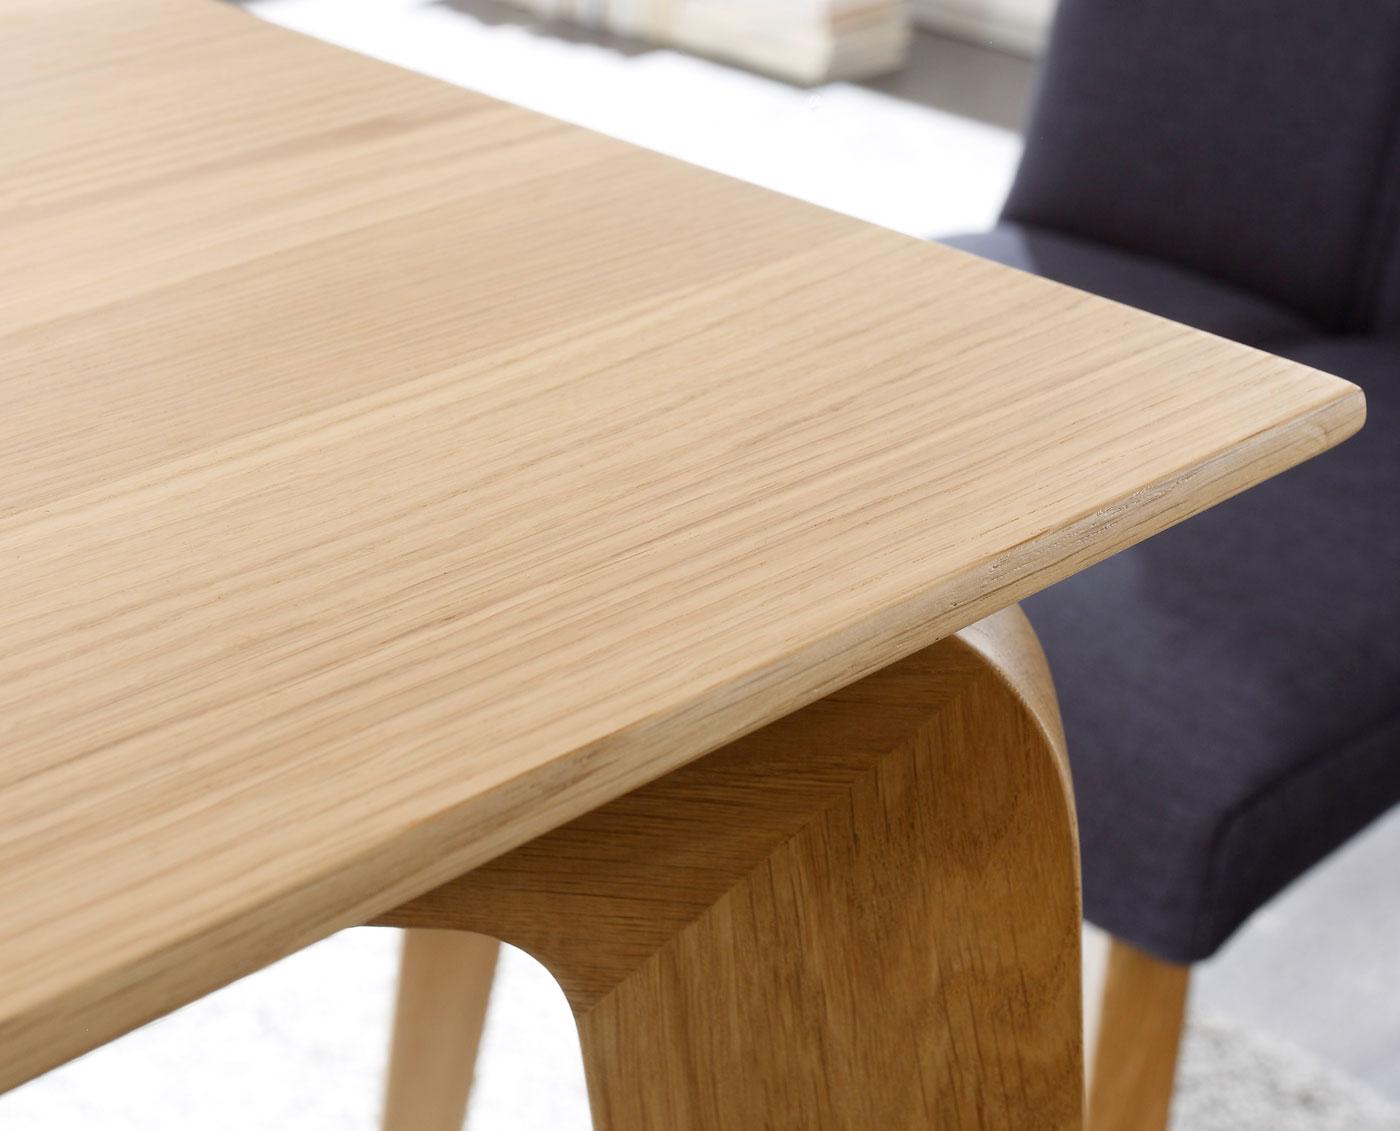 Standard Furniture Liam Tresentisch massiv